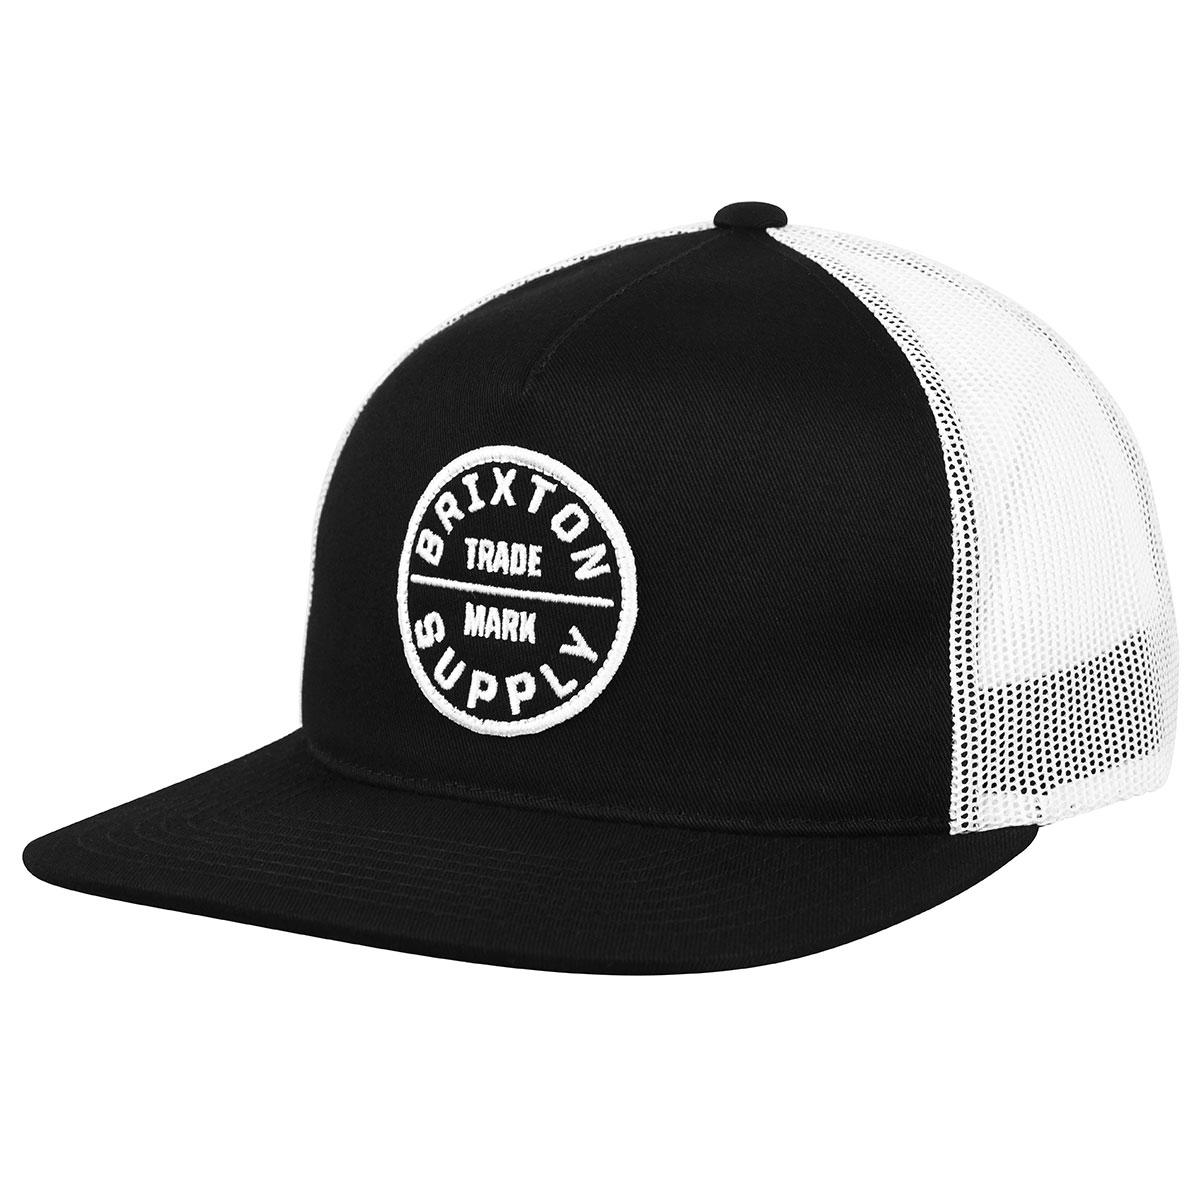 Brixton Oath III Mesh Cap in Black